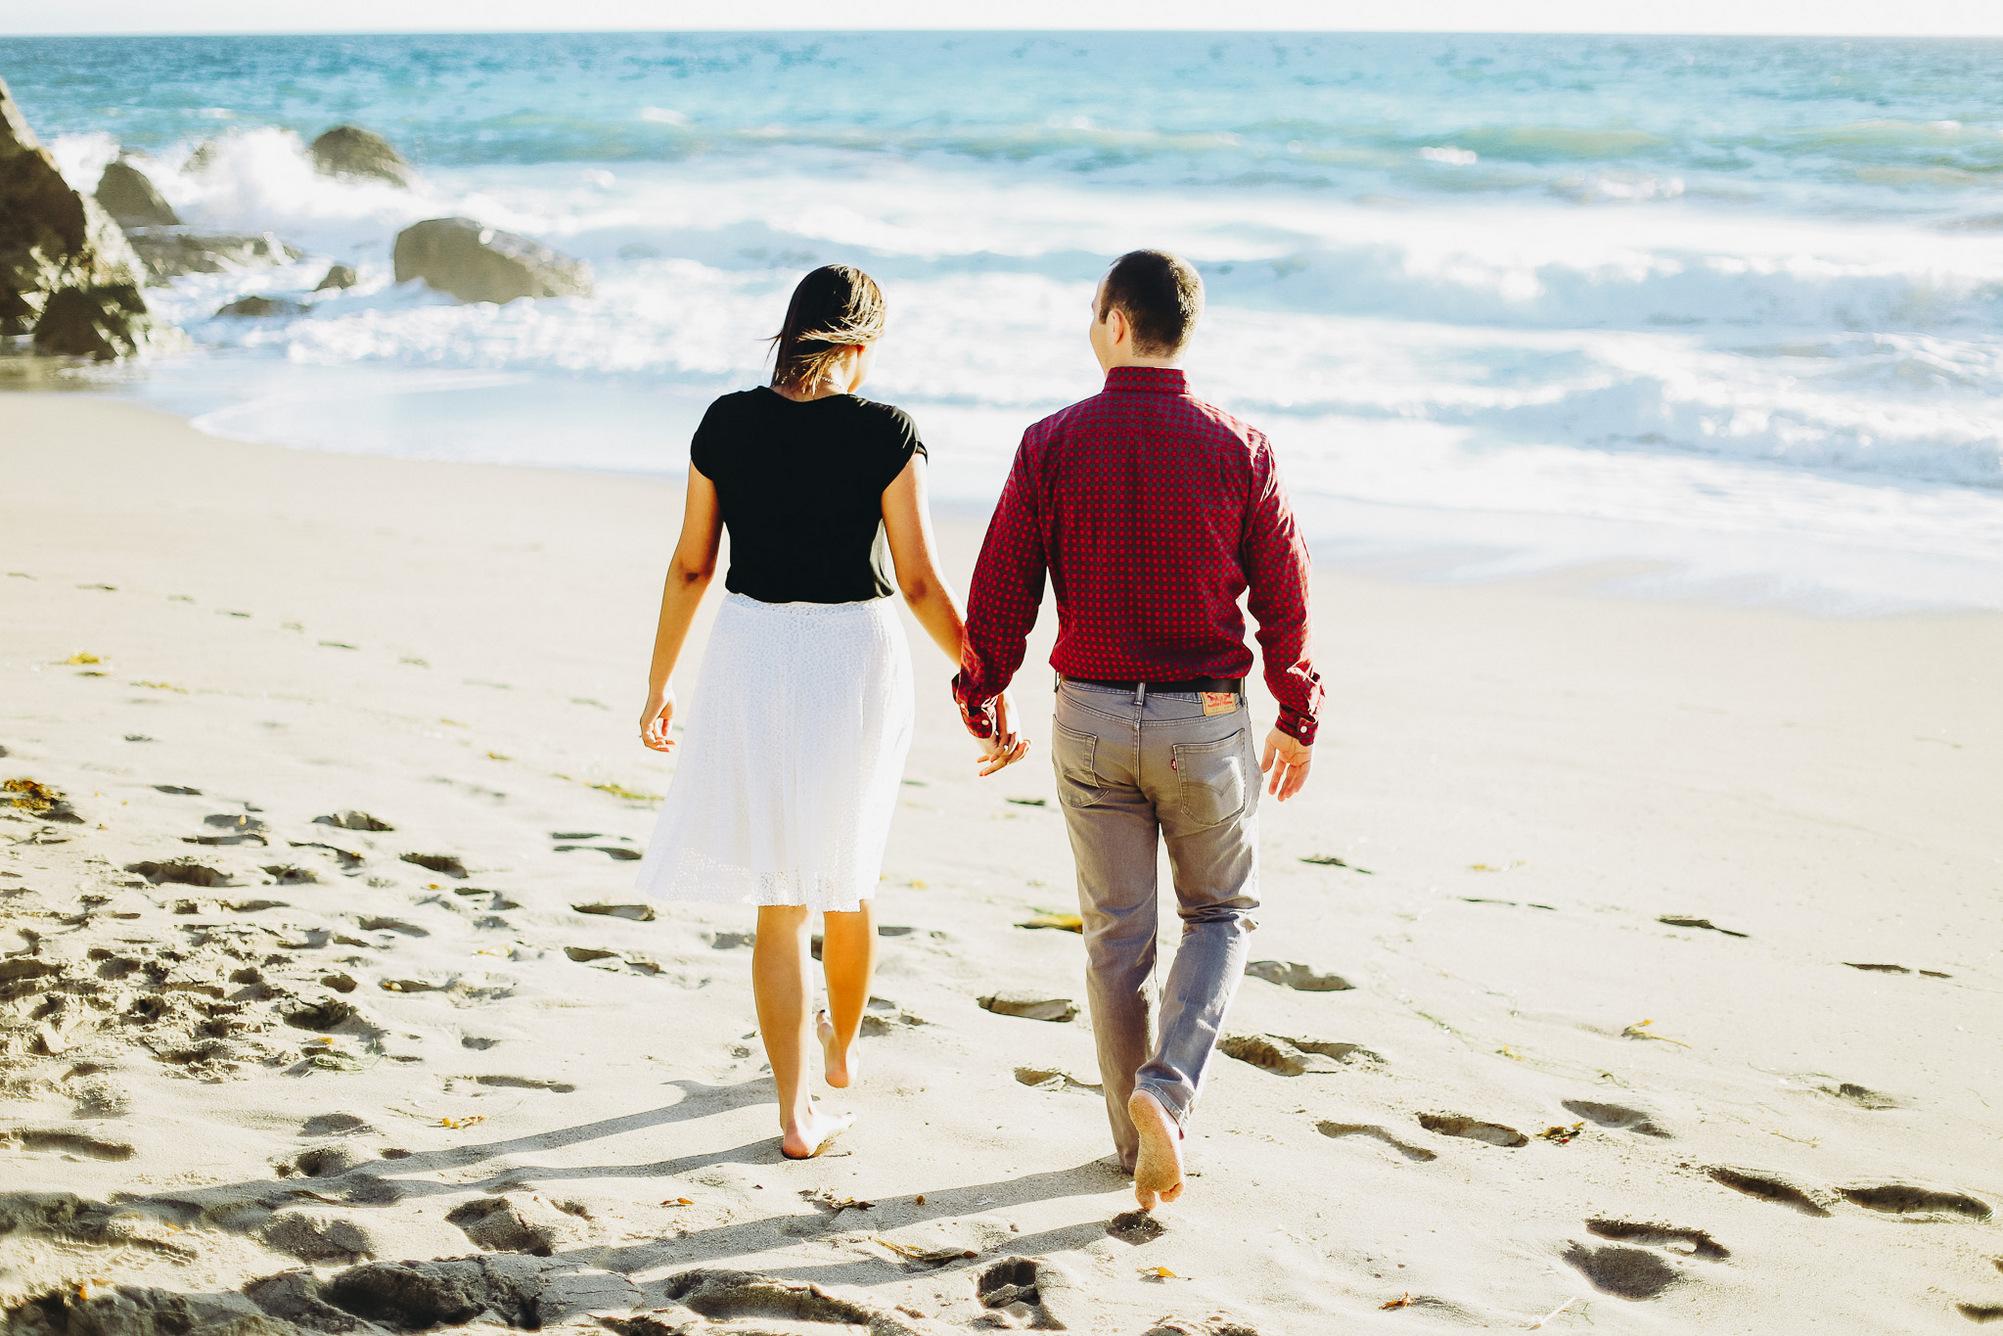 walking barefoot on the beach